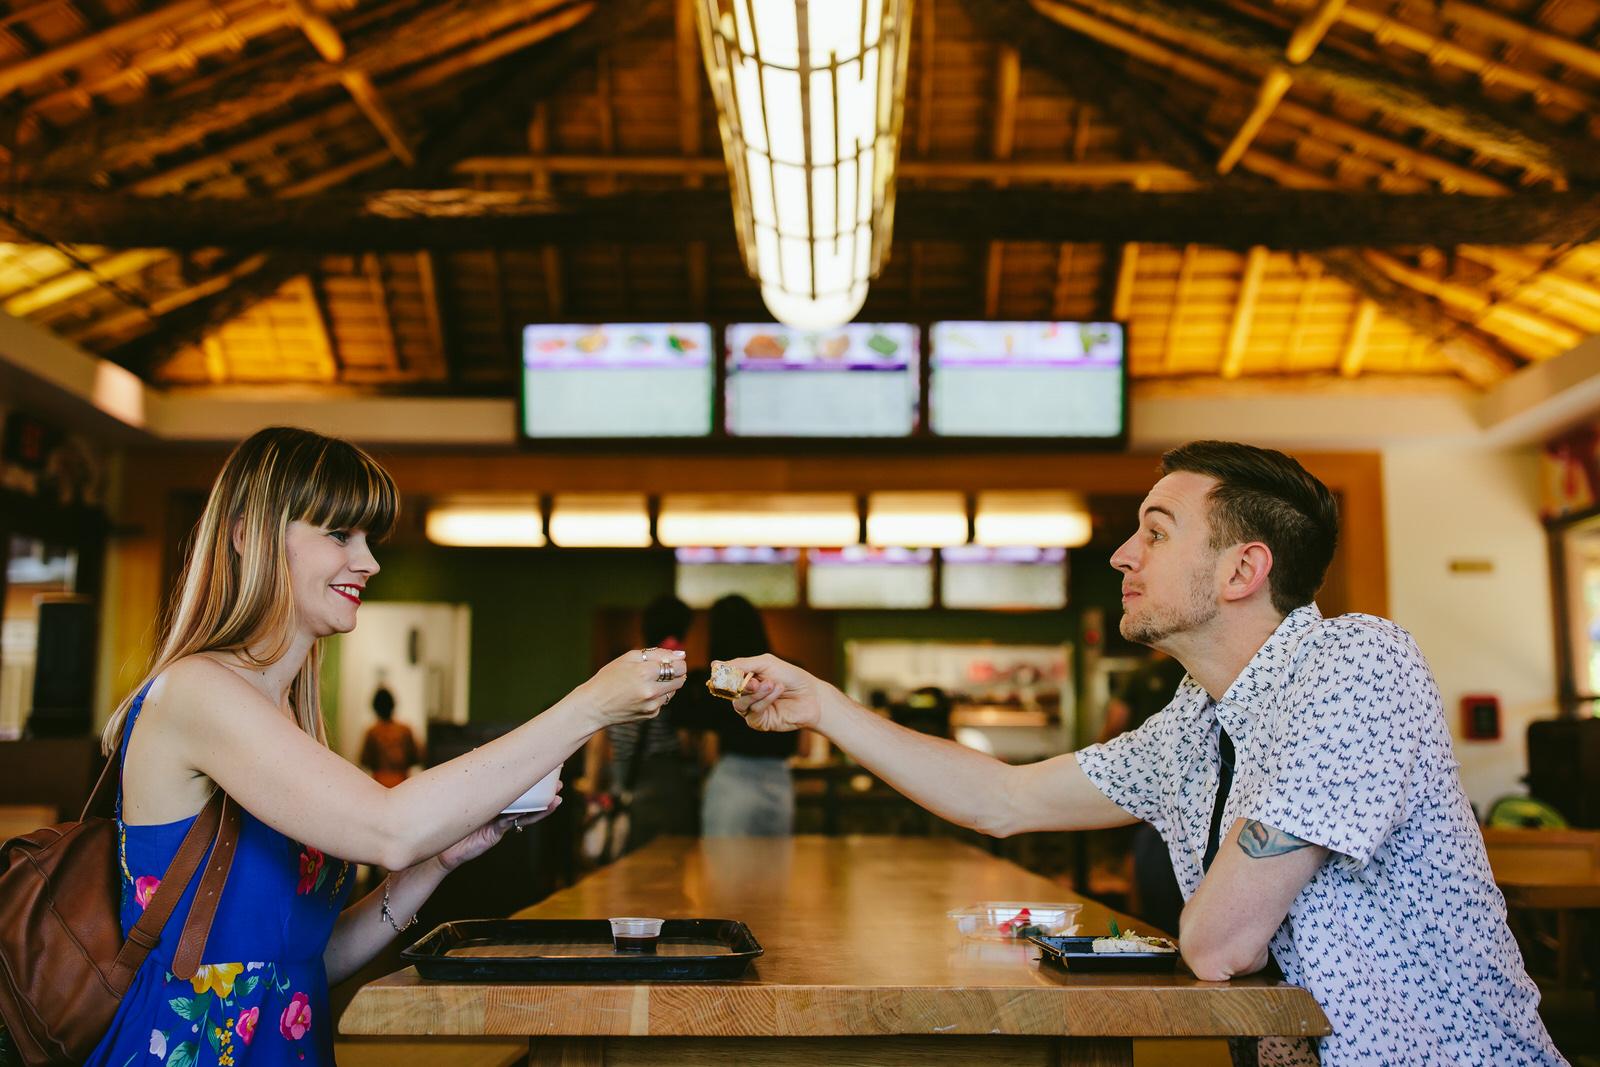 Adorable-Engagement-Session-Epcot-Orlando-Tiny-House-Photo-Wedding-Photographer-4.jpg